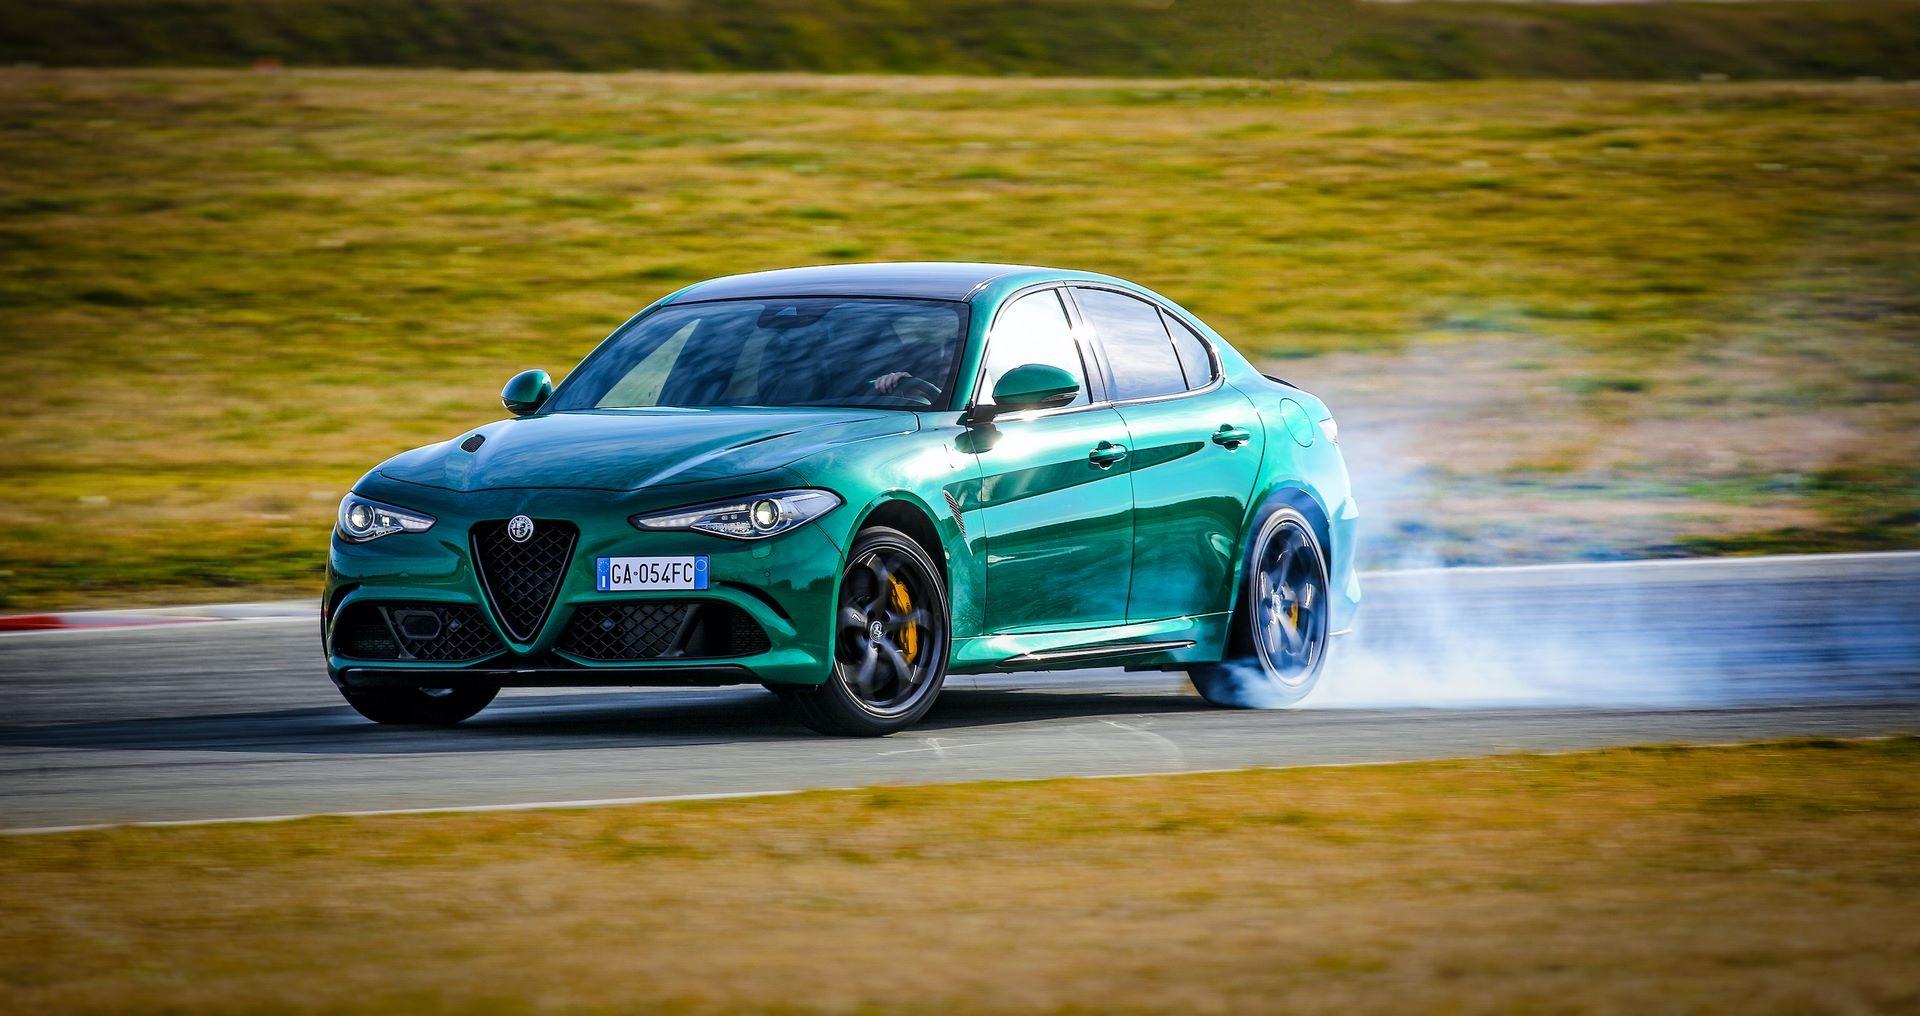 Alfa-Romeo-Giulia-Quadrifoglio-Stelvio-Quadrifoglio-facelift-2020-1